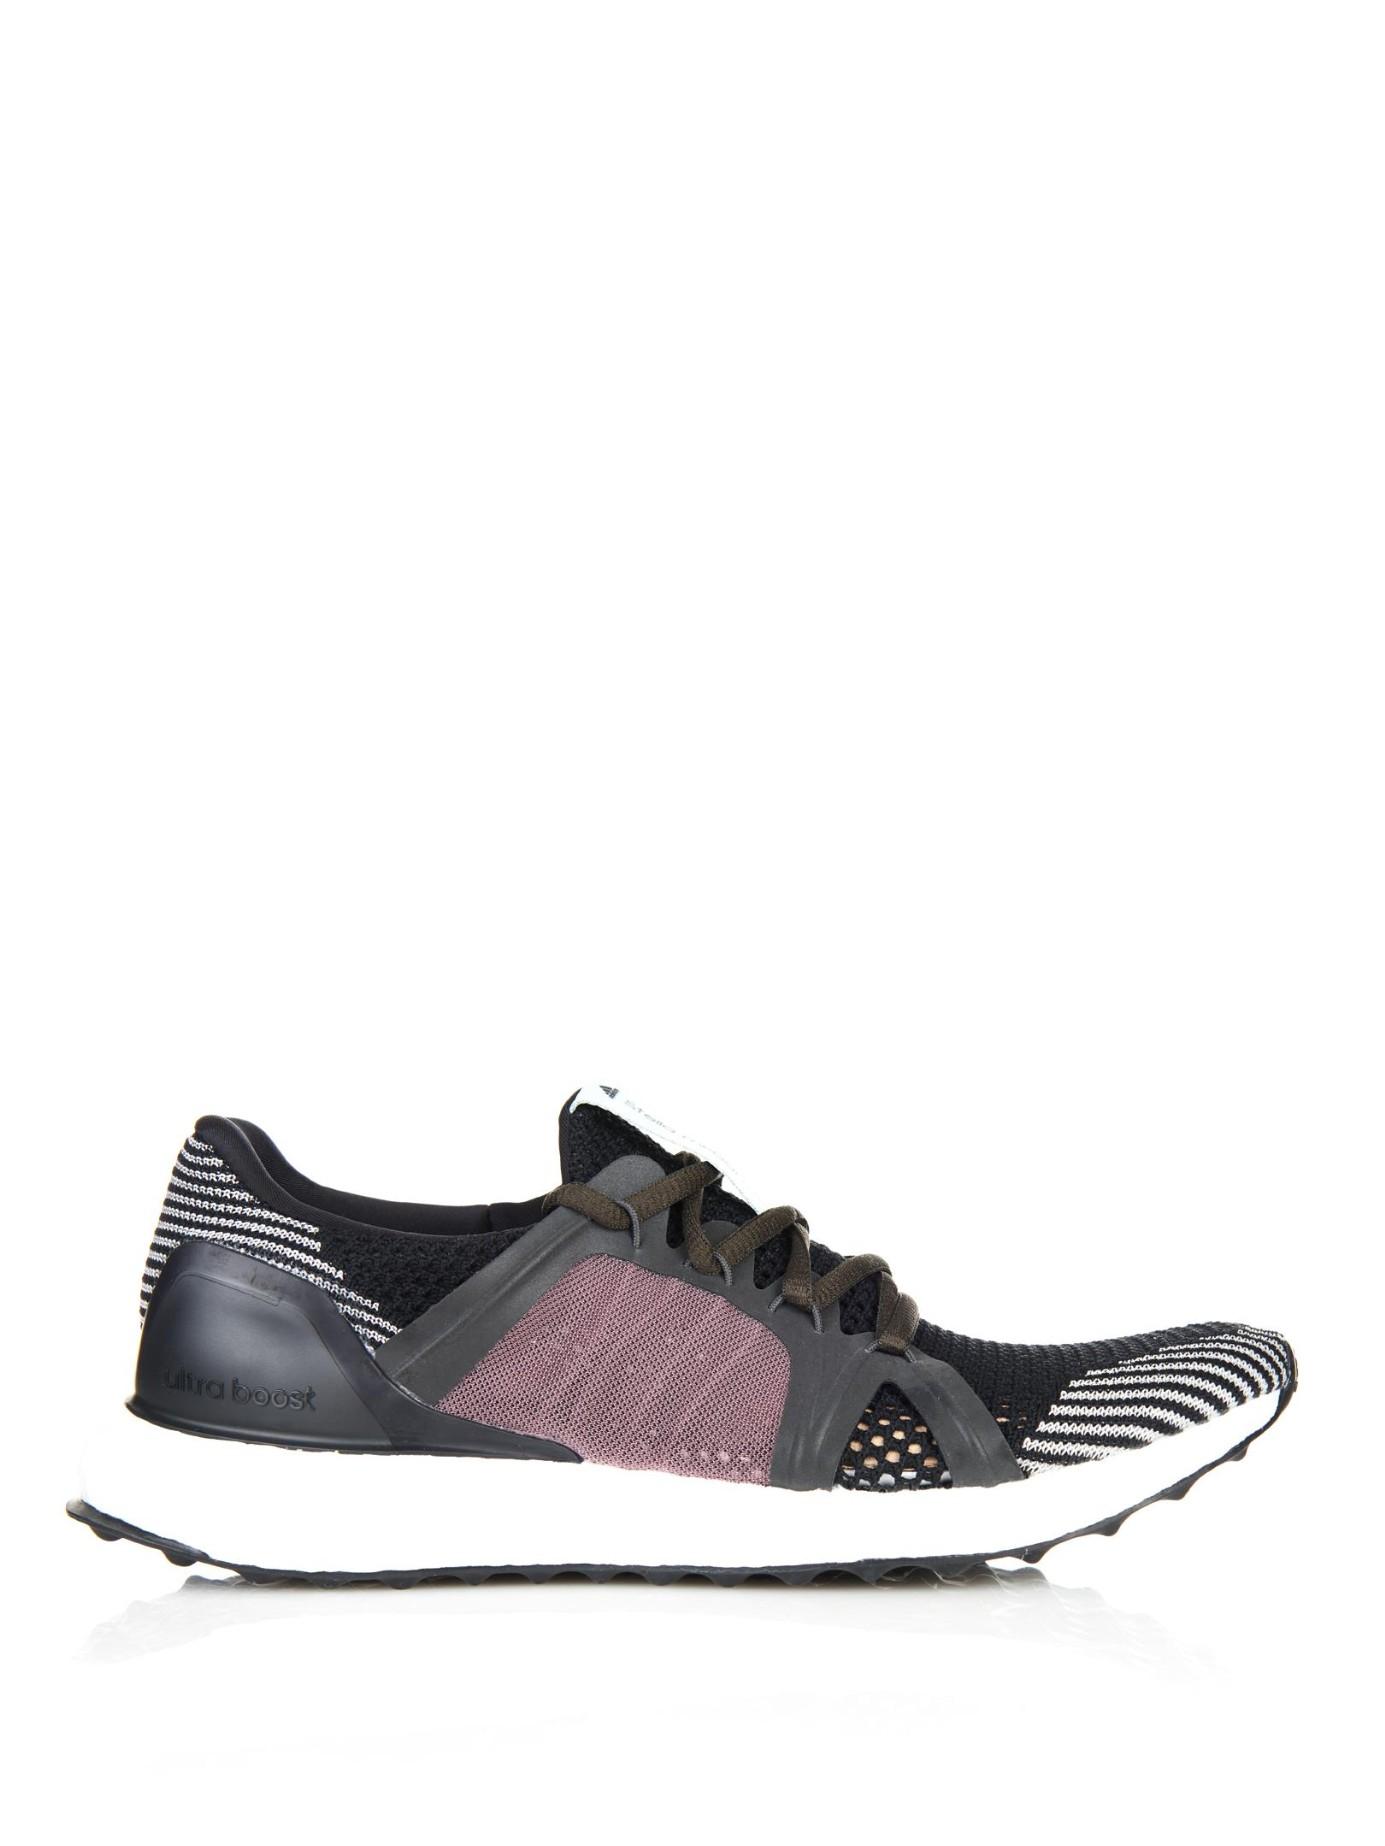 Adidas Par Dessus Bas-et Baskets Stella Mccartney uAmRi7SOS